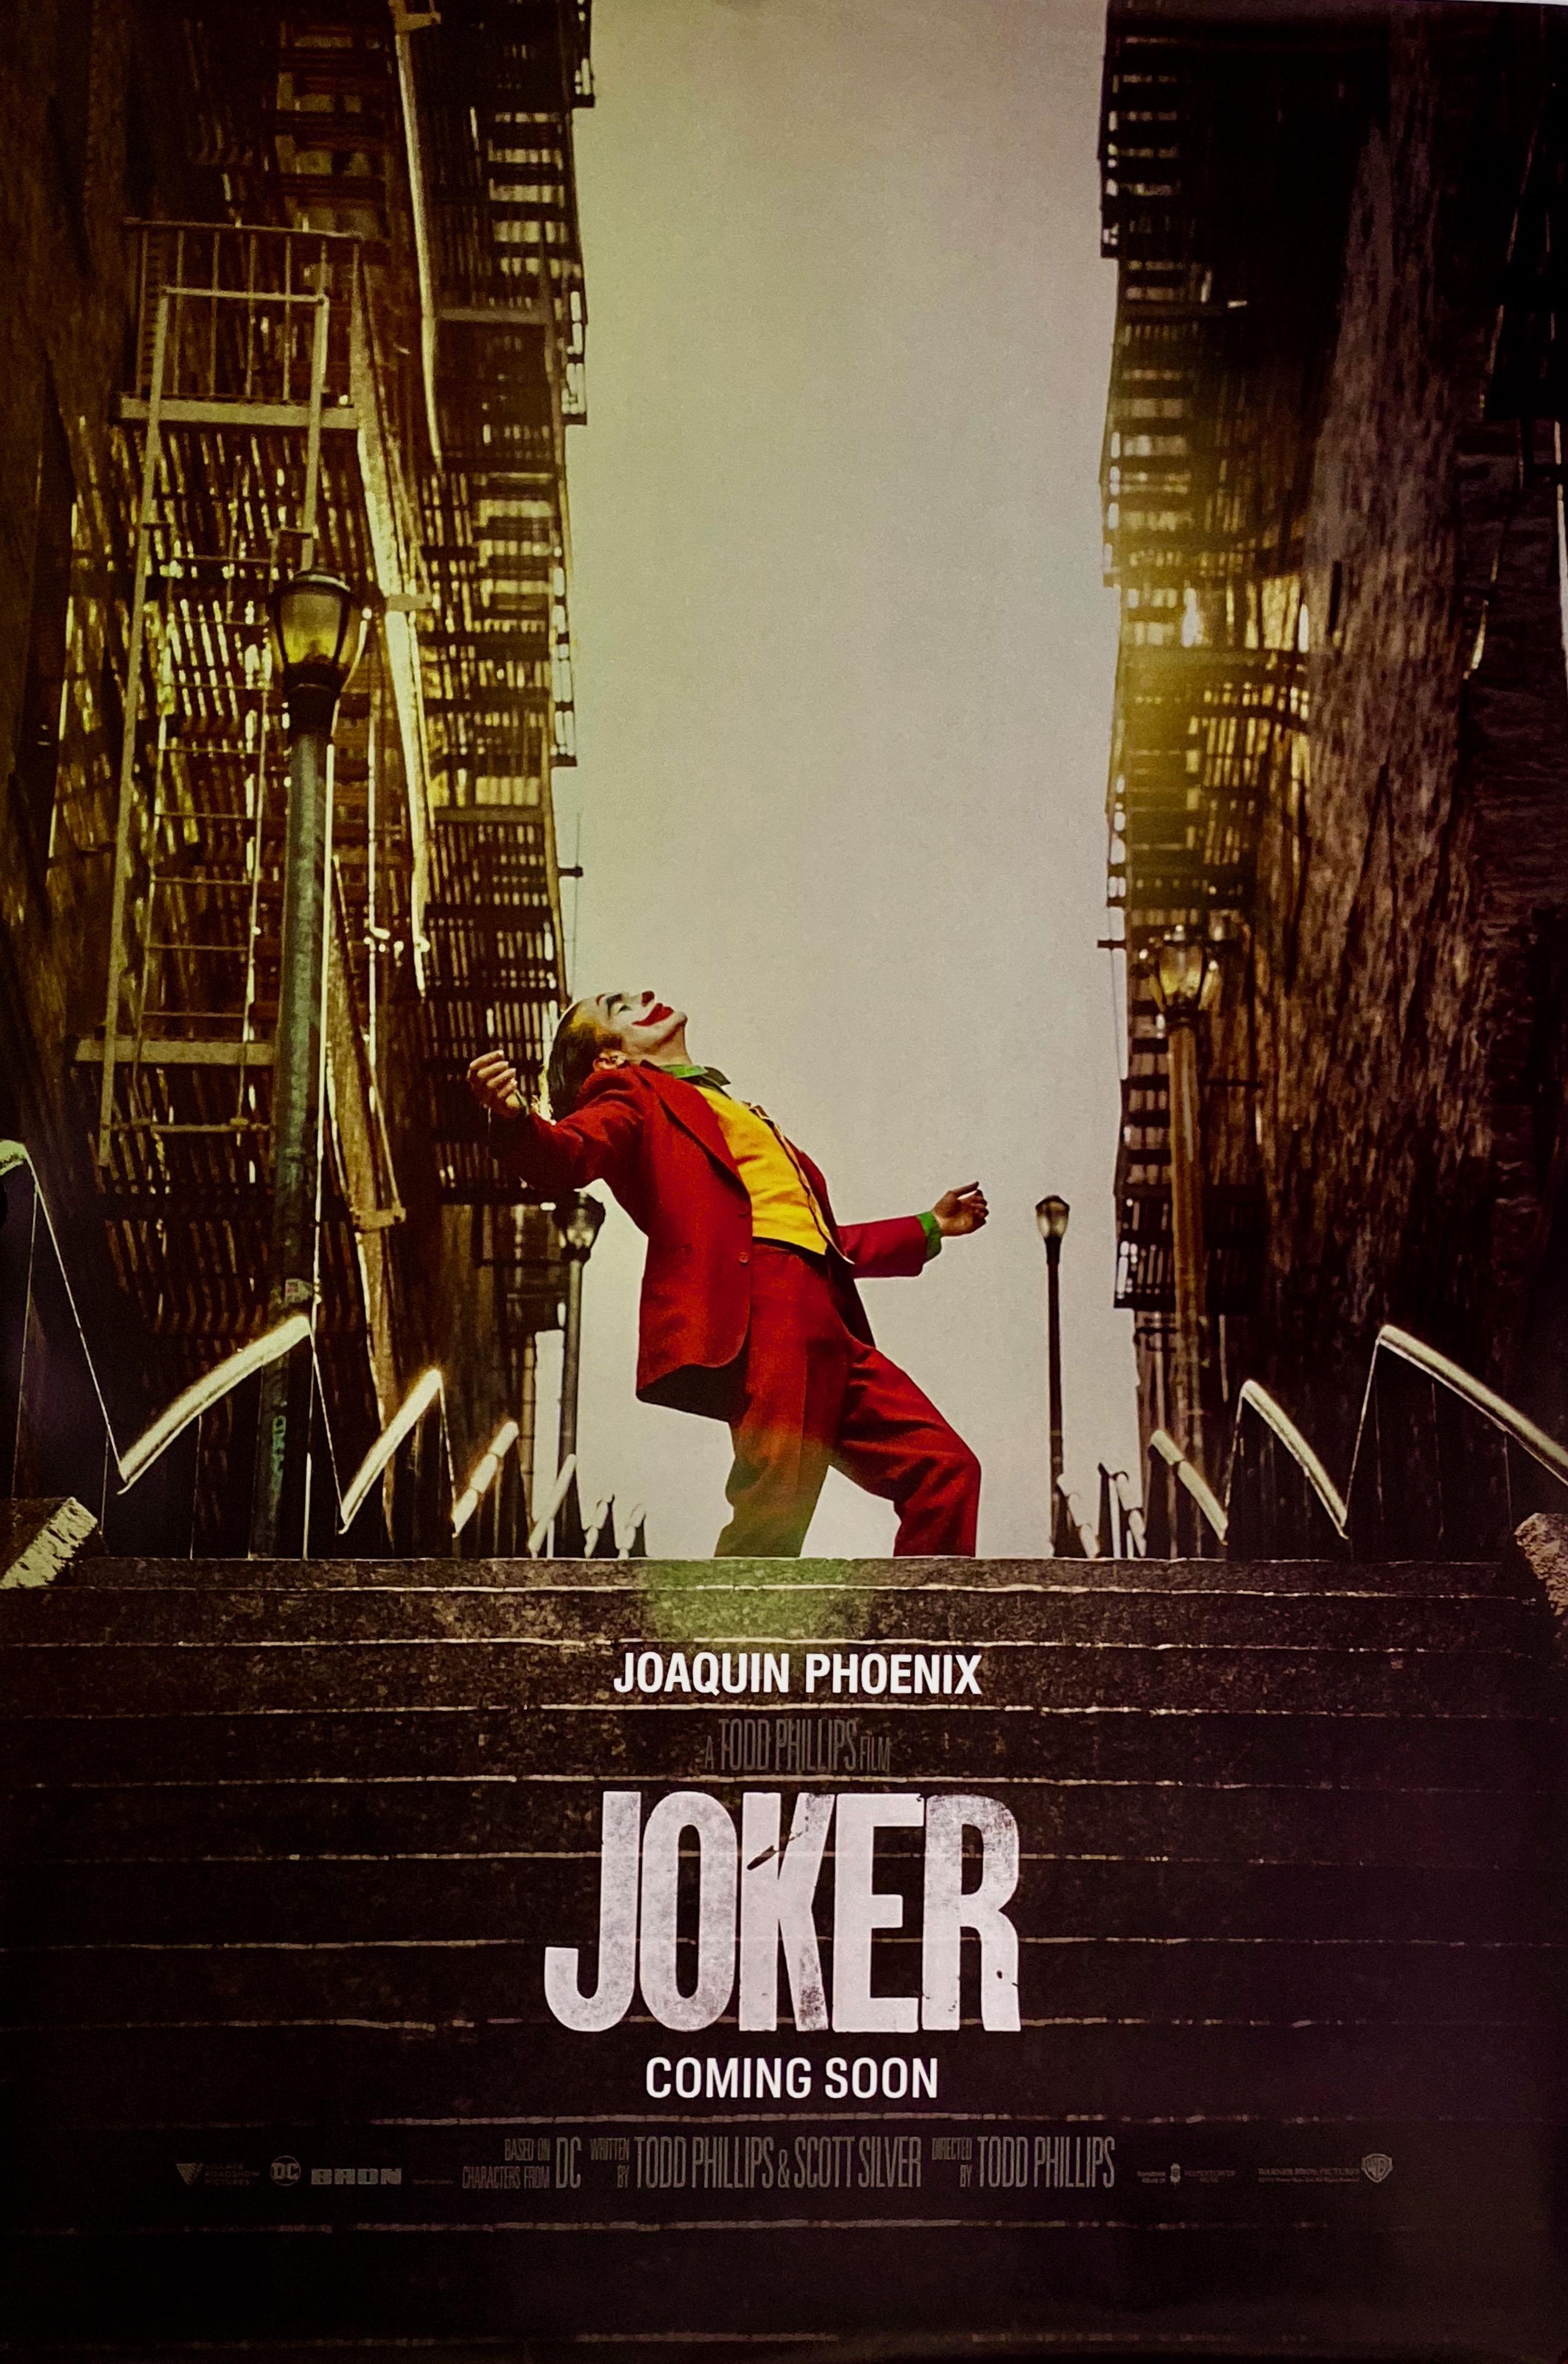 Original Joker Movie Poster - Joaquin Phoenix - Batman - Gotham City